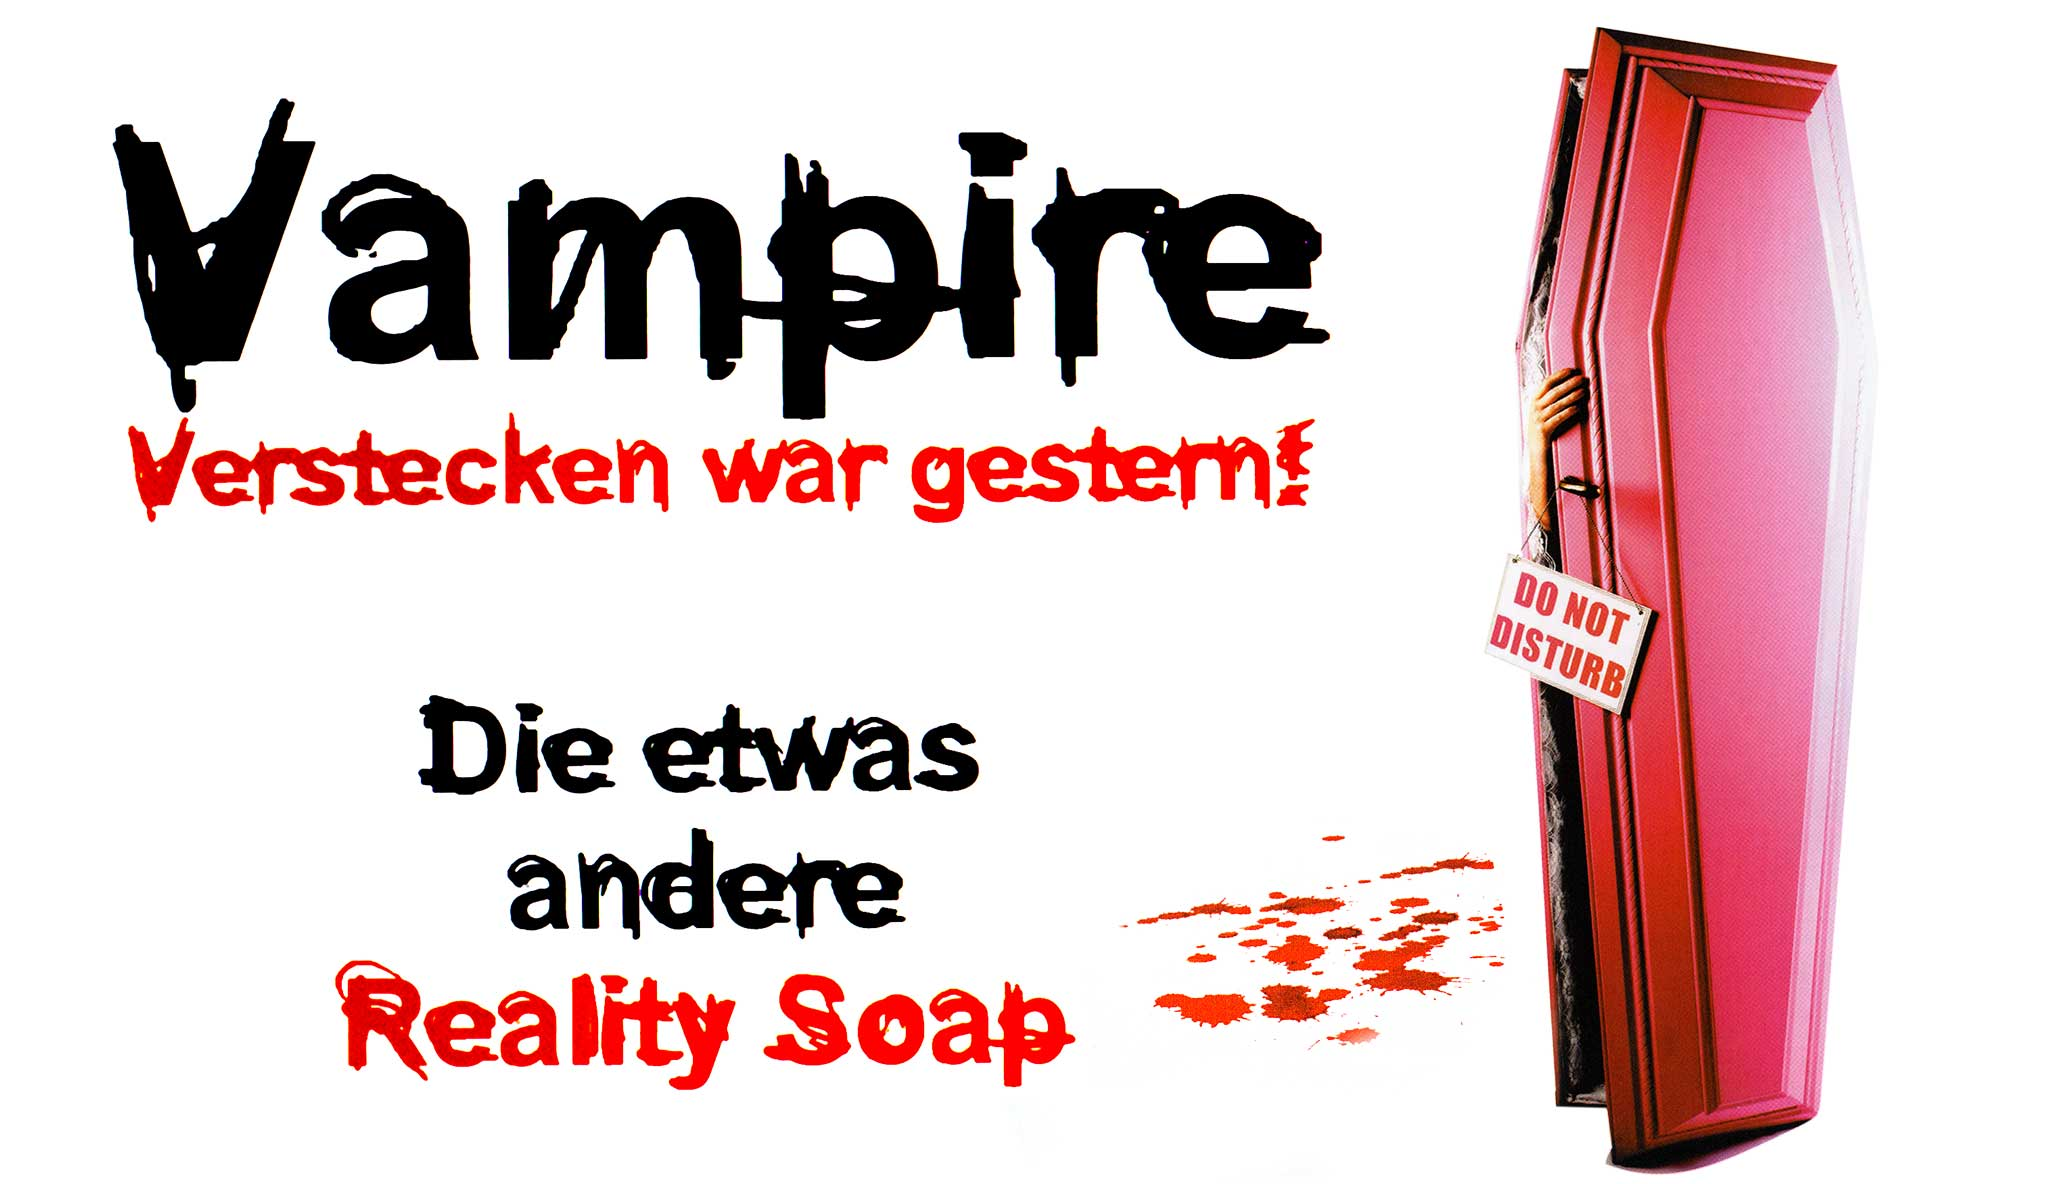 vampire-verstecken-war-gestern\header.jpg